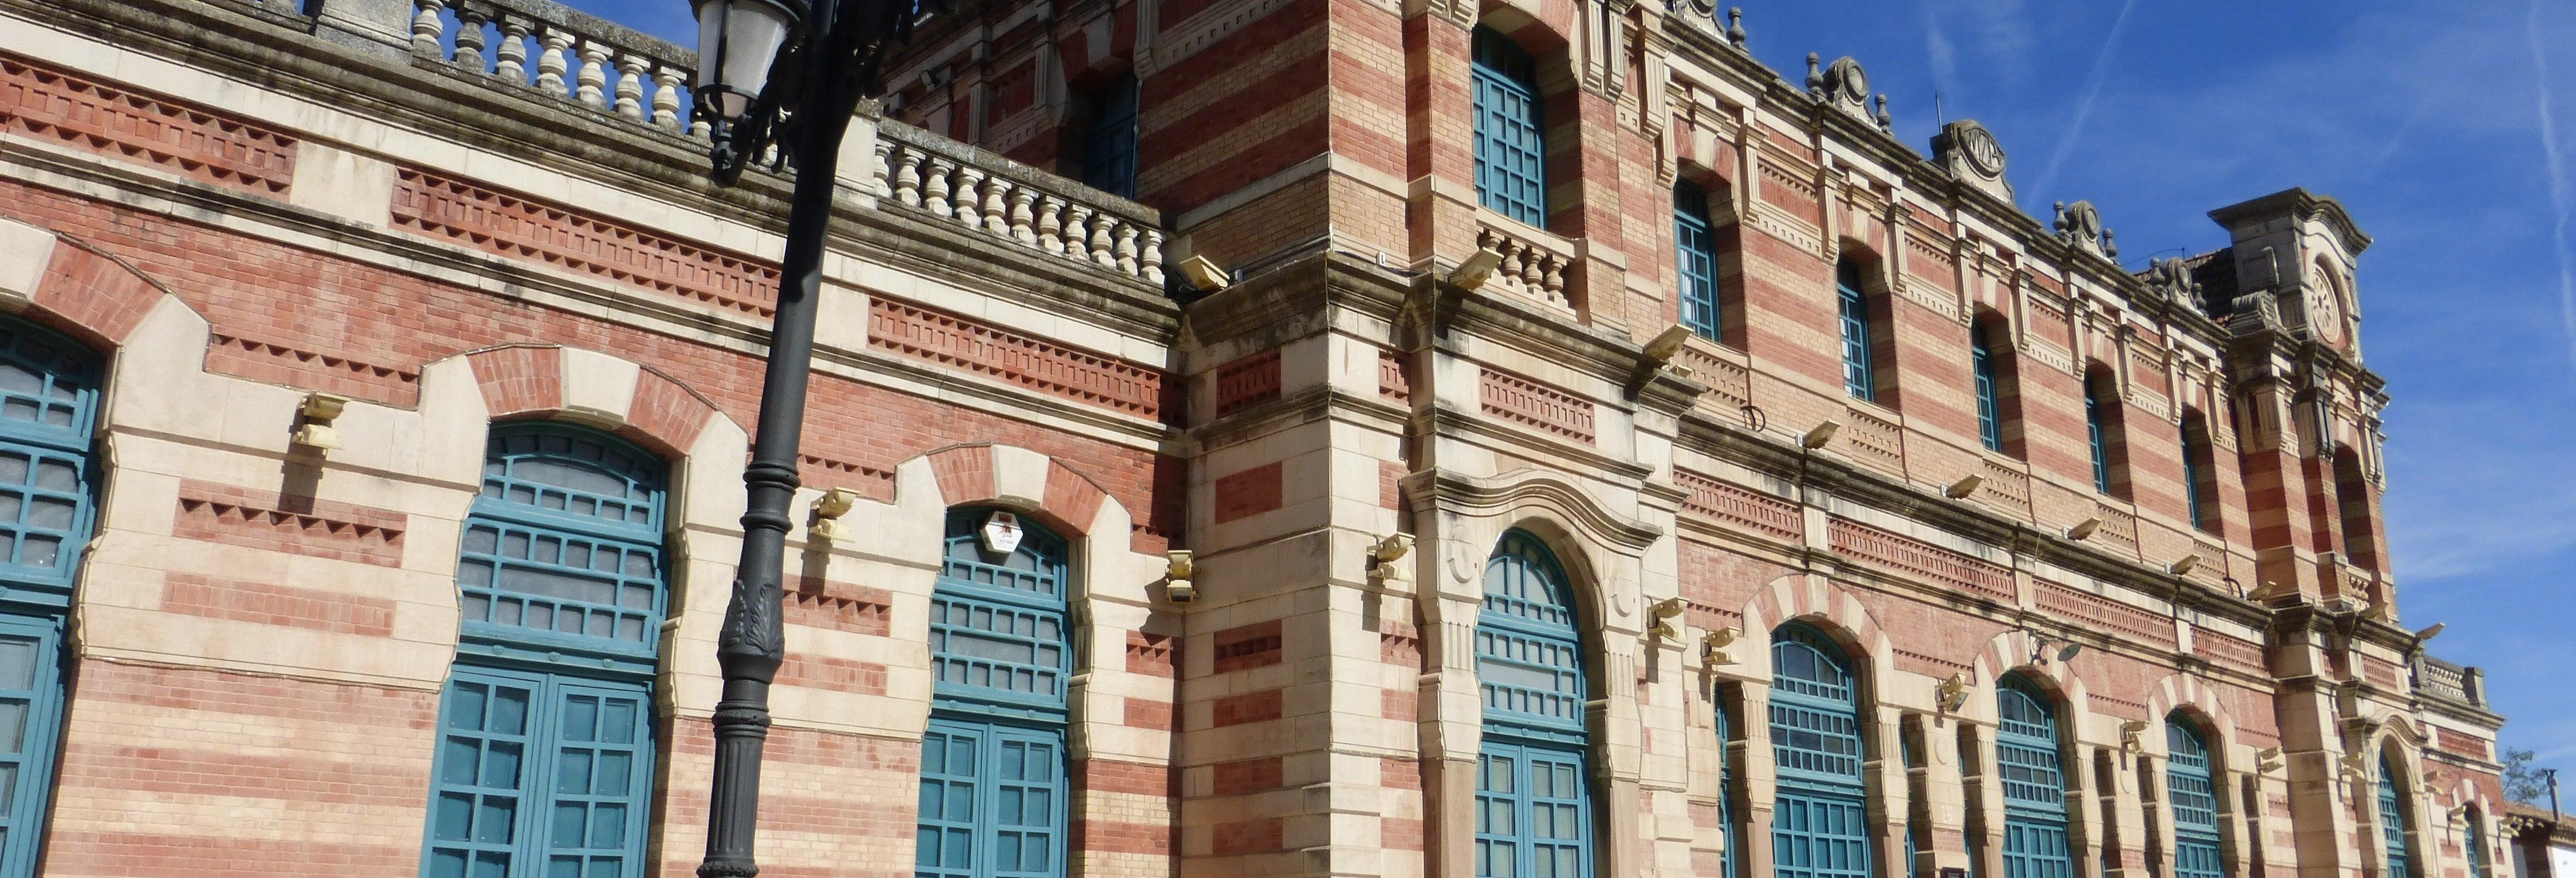 Visita guiada por Linares